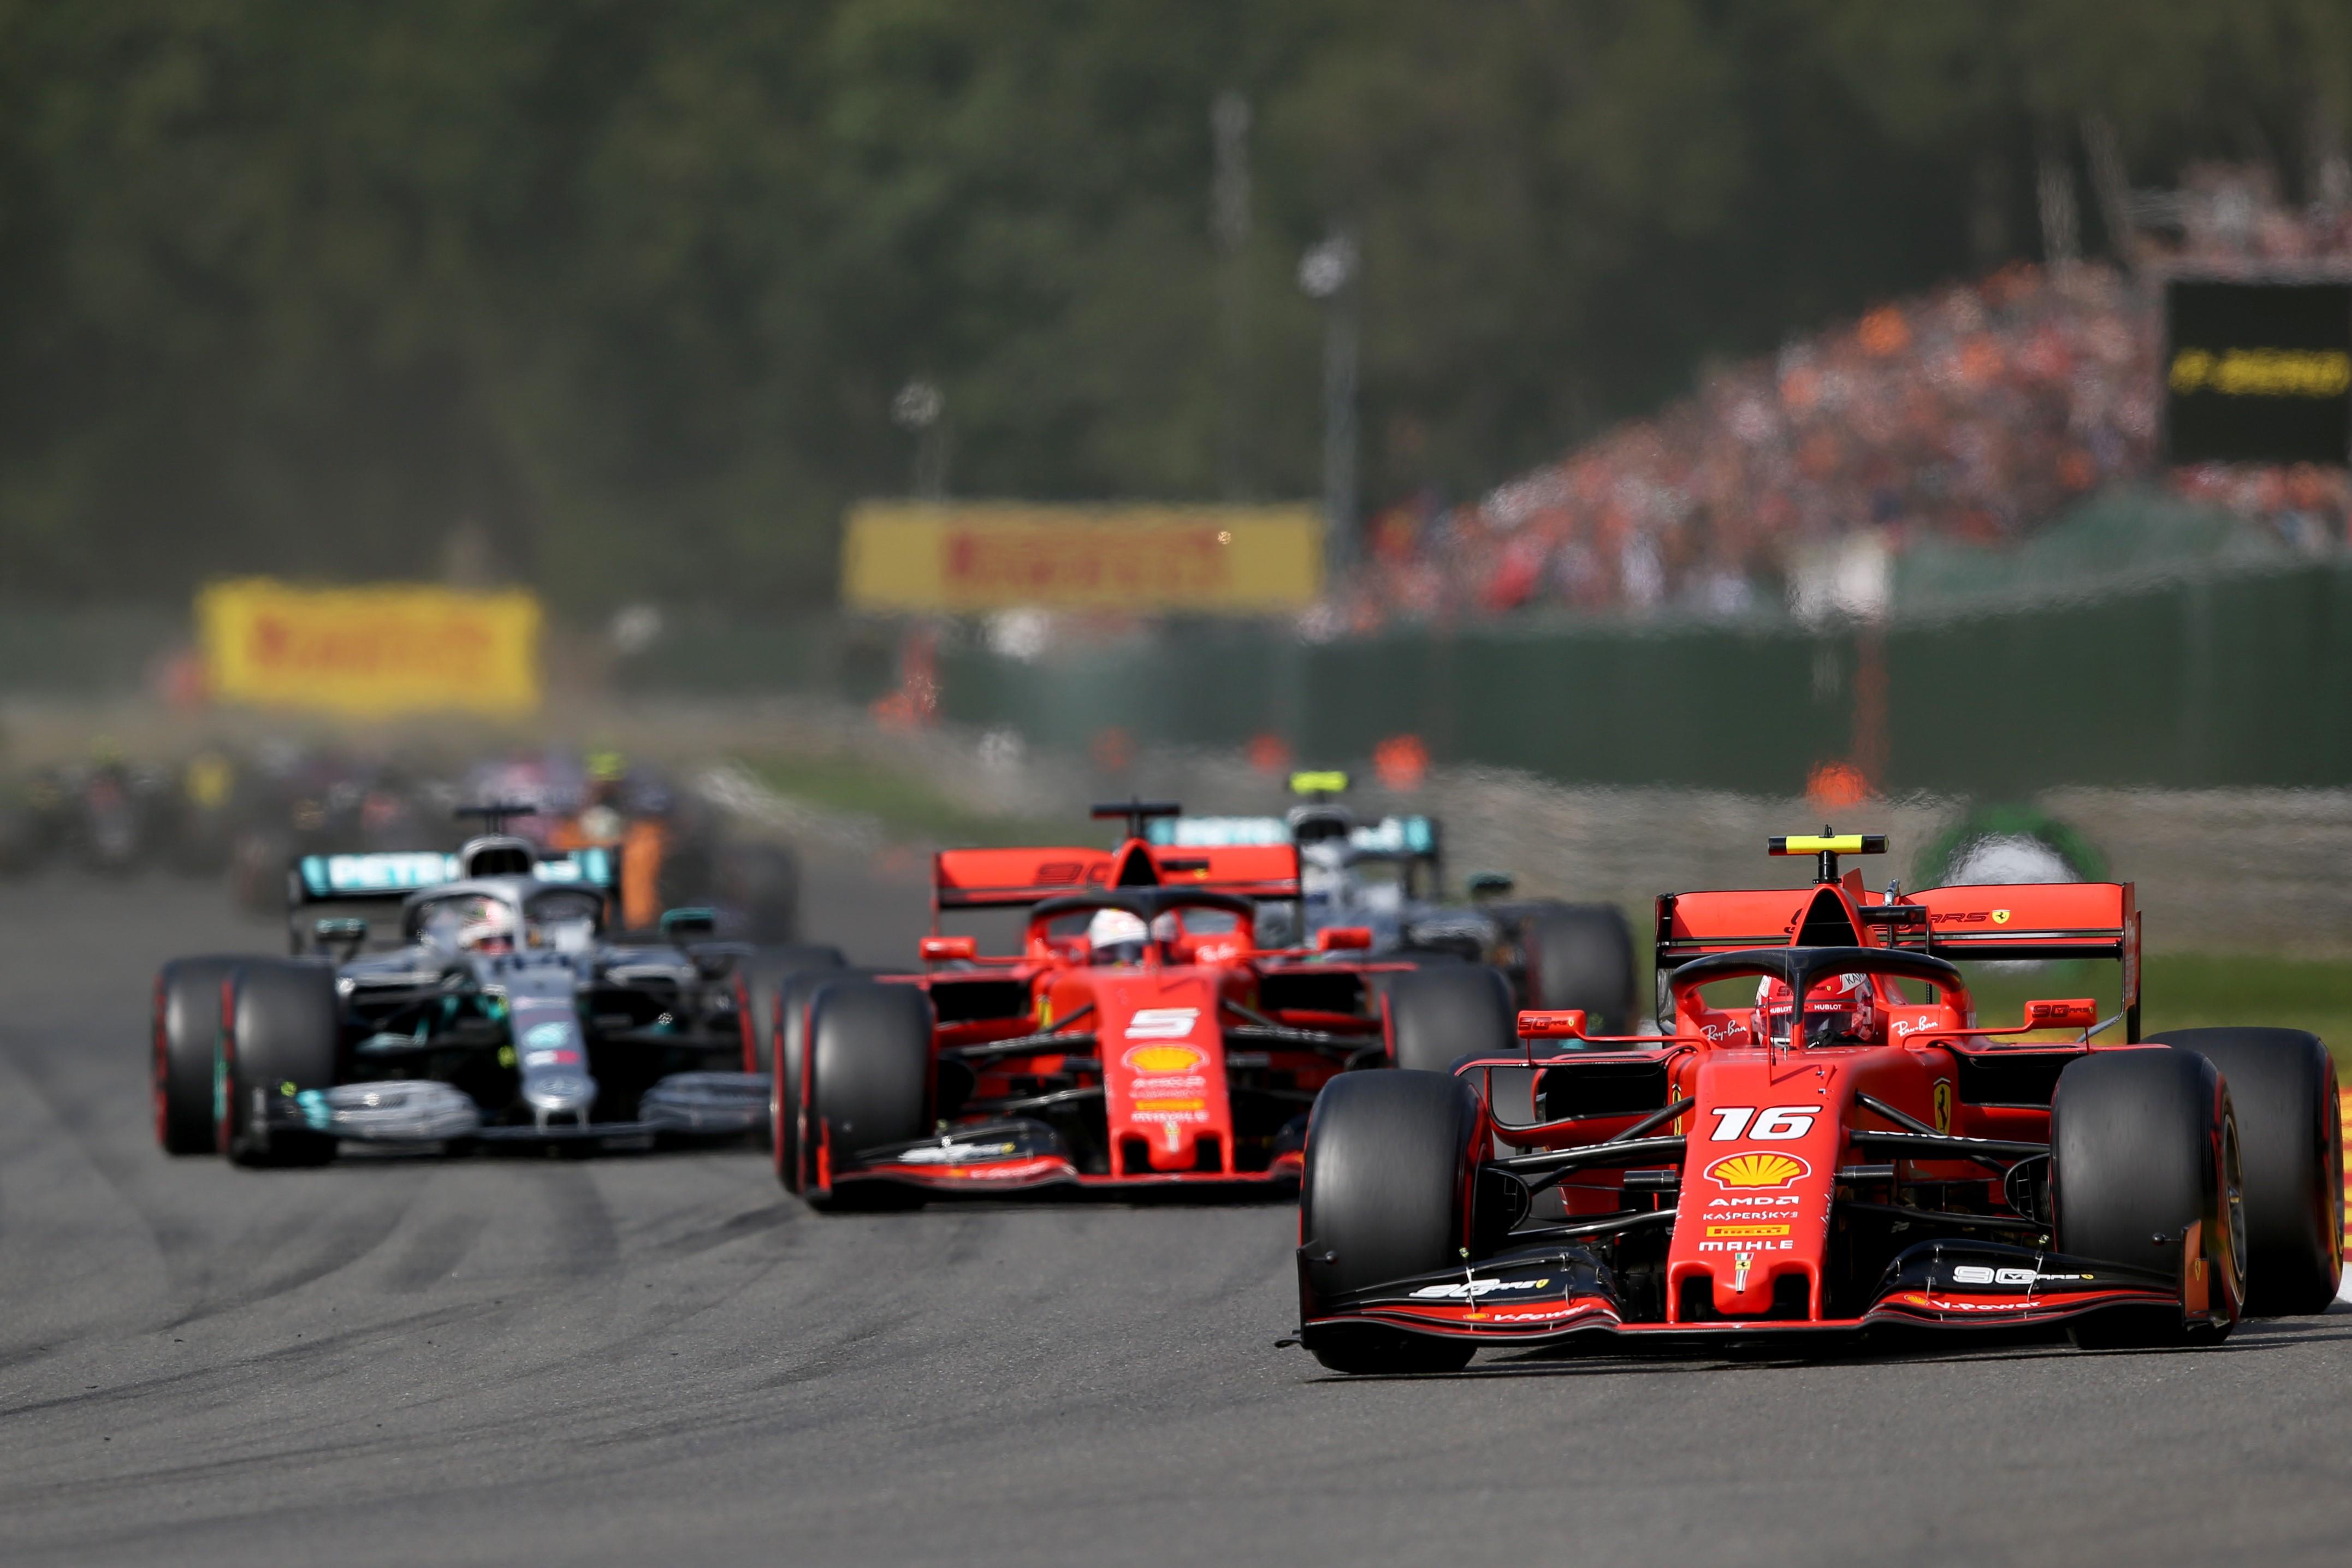 Charles Leclerc, Sebastian Vettel (Ferrari) - 2019 Belçika GP